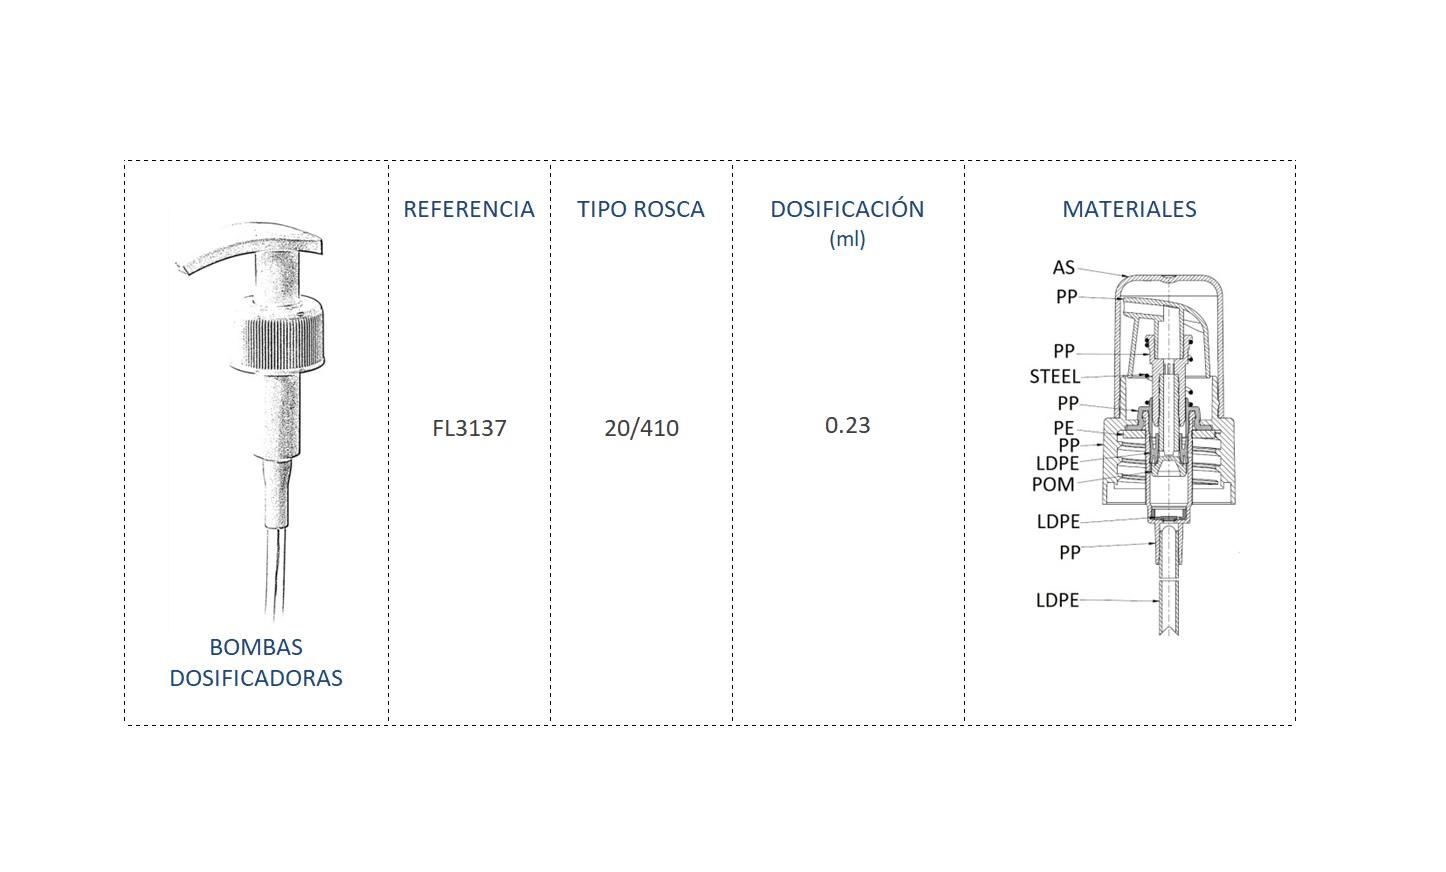 Cuadro de materiales bomba dosificadora FL3137 20/410